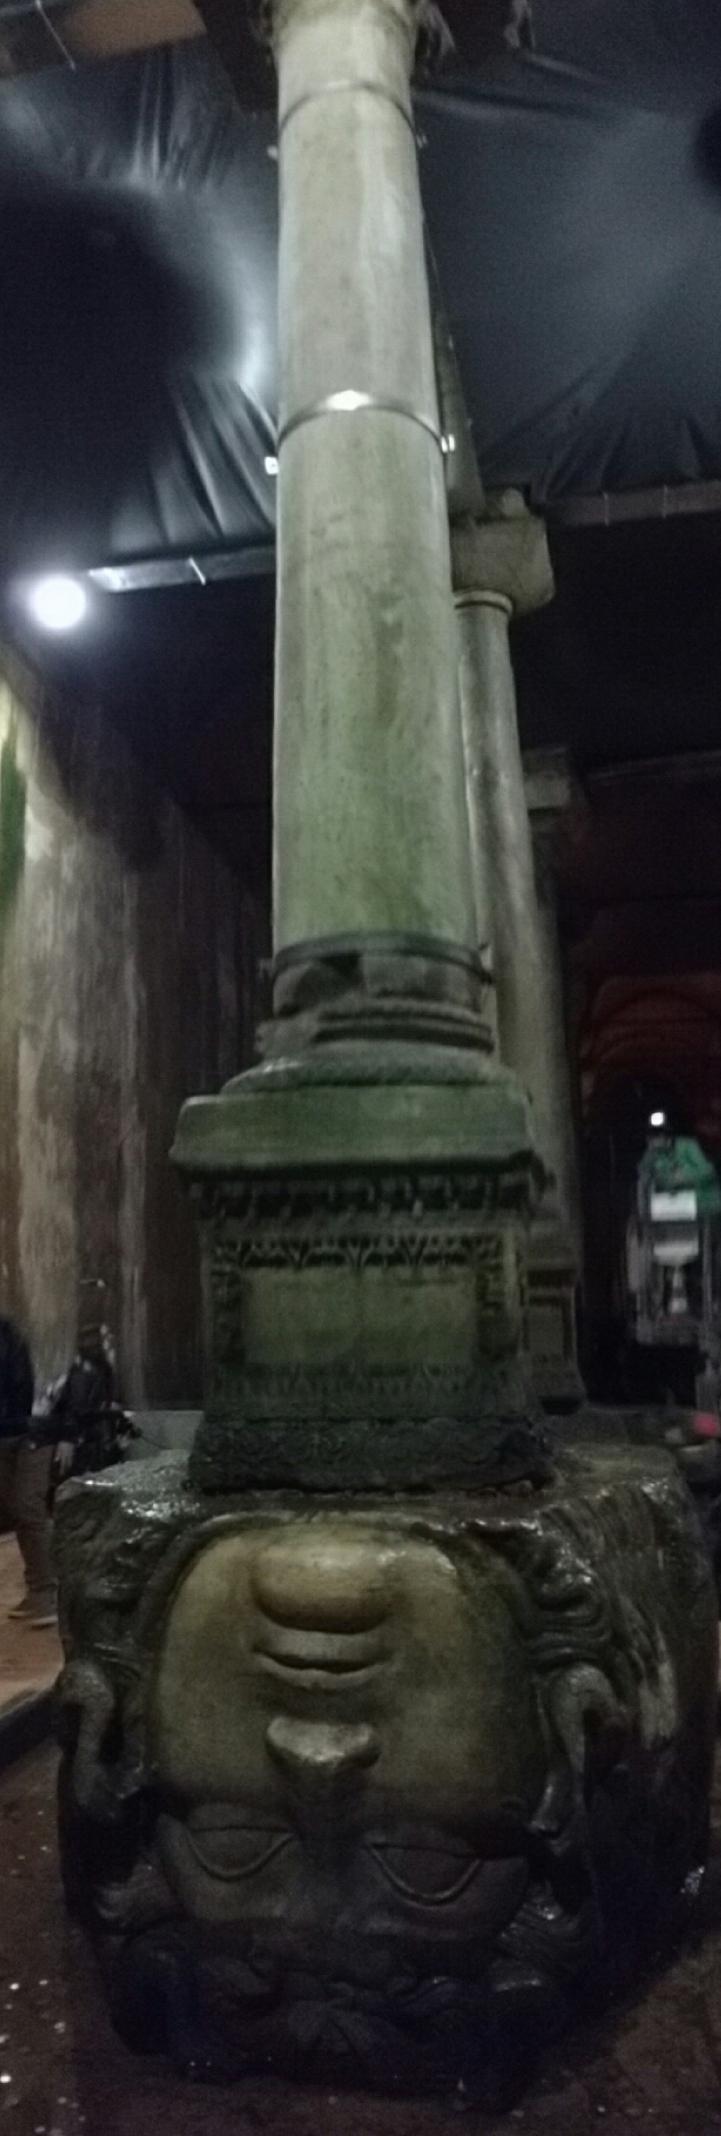 Medusa head at the base of the Basilica Cistern column.